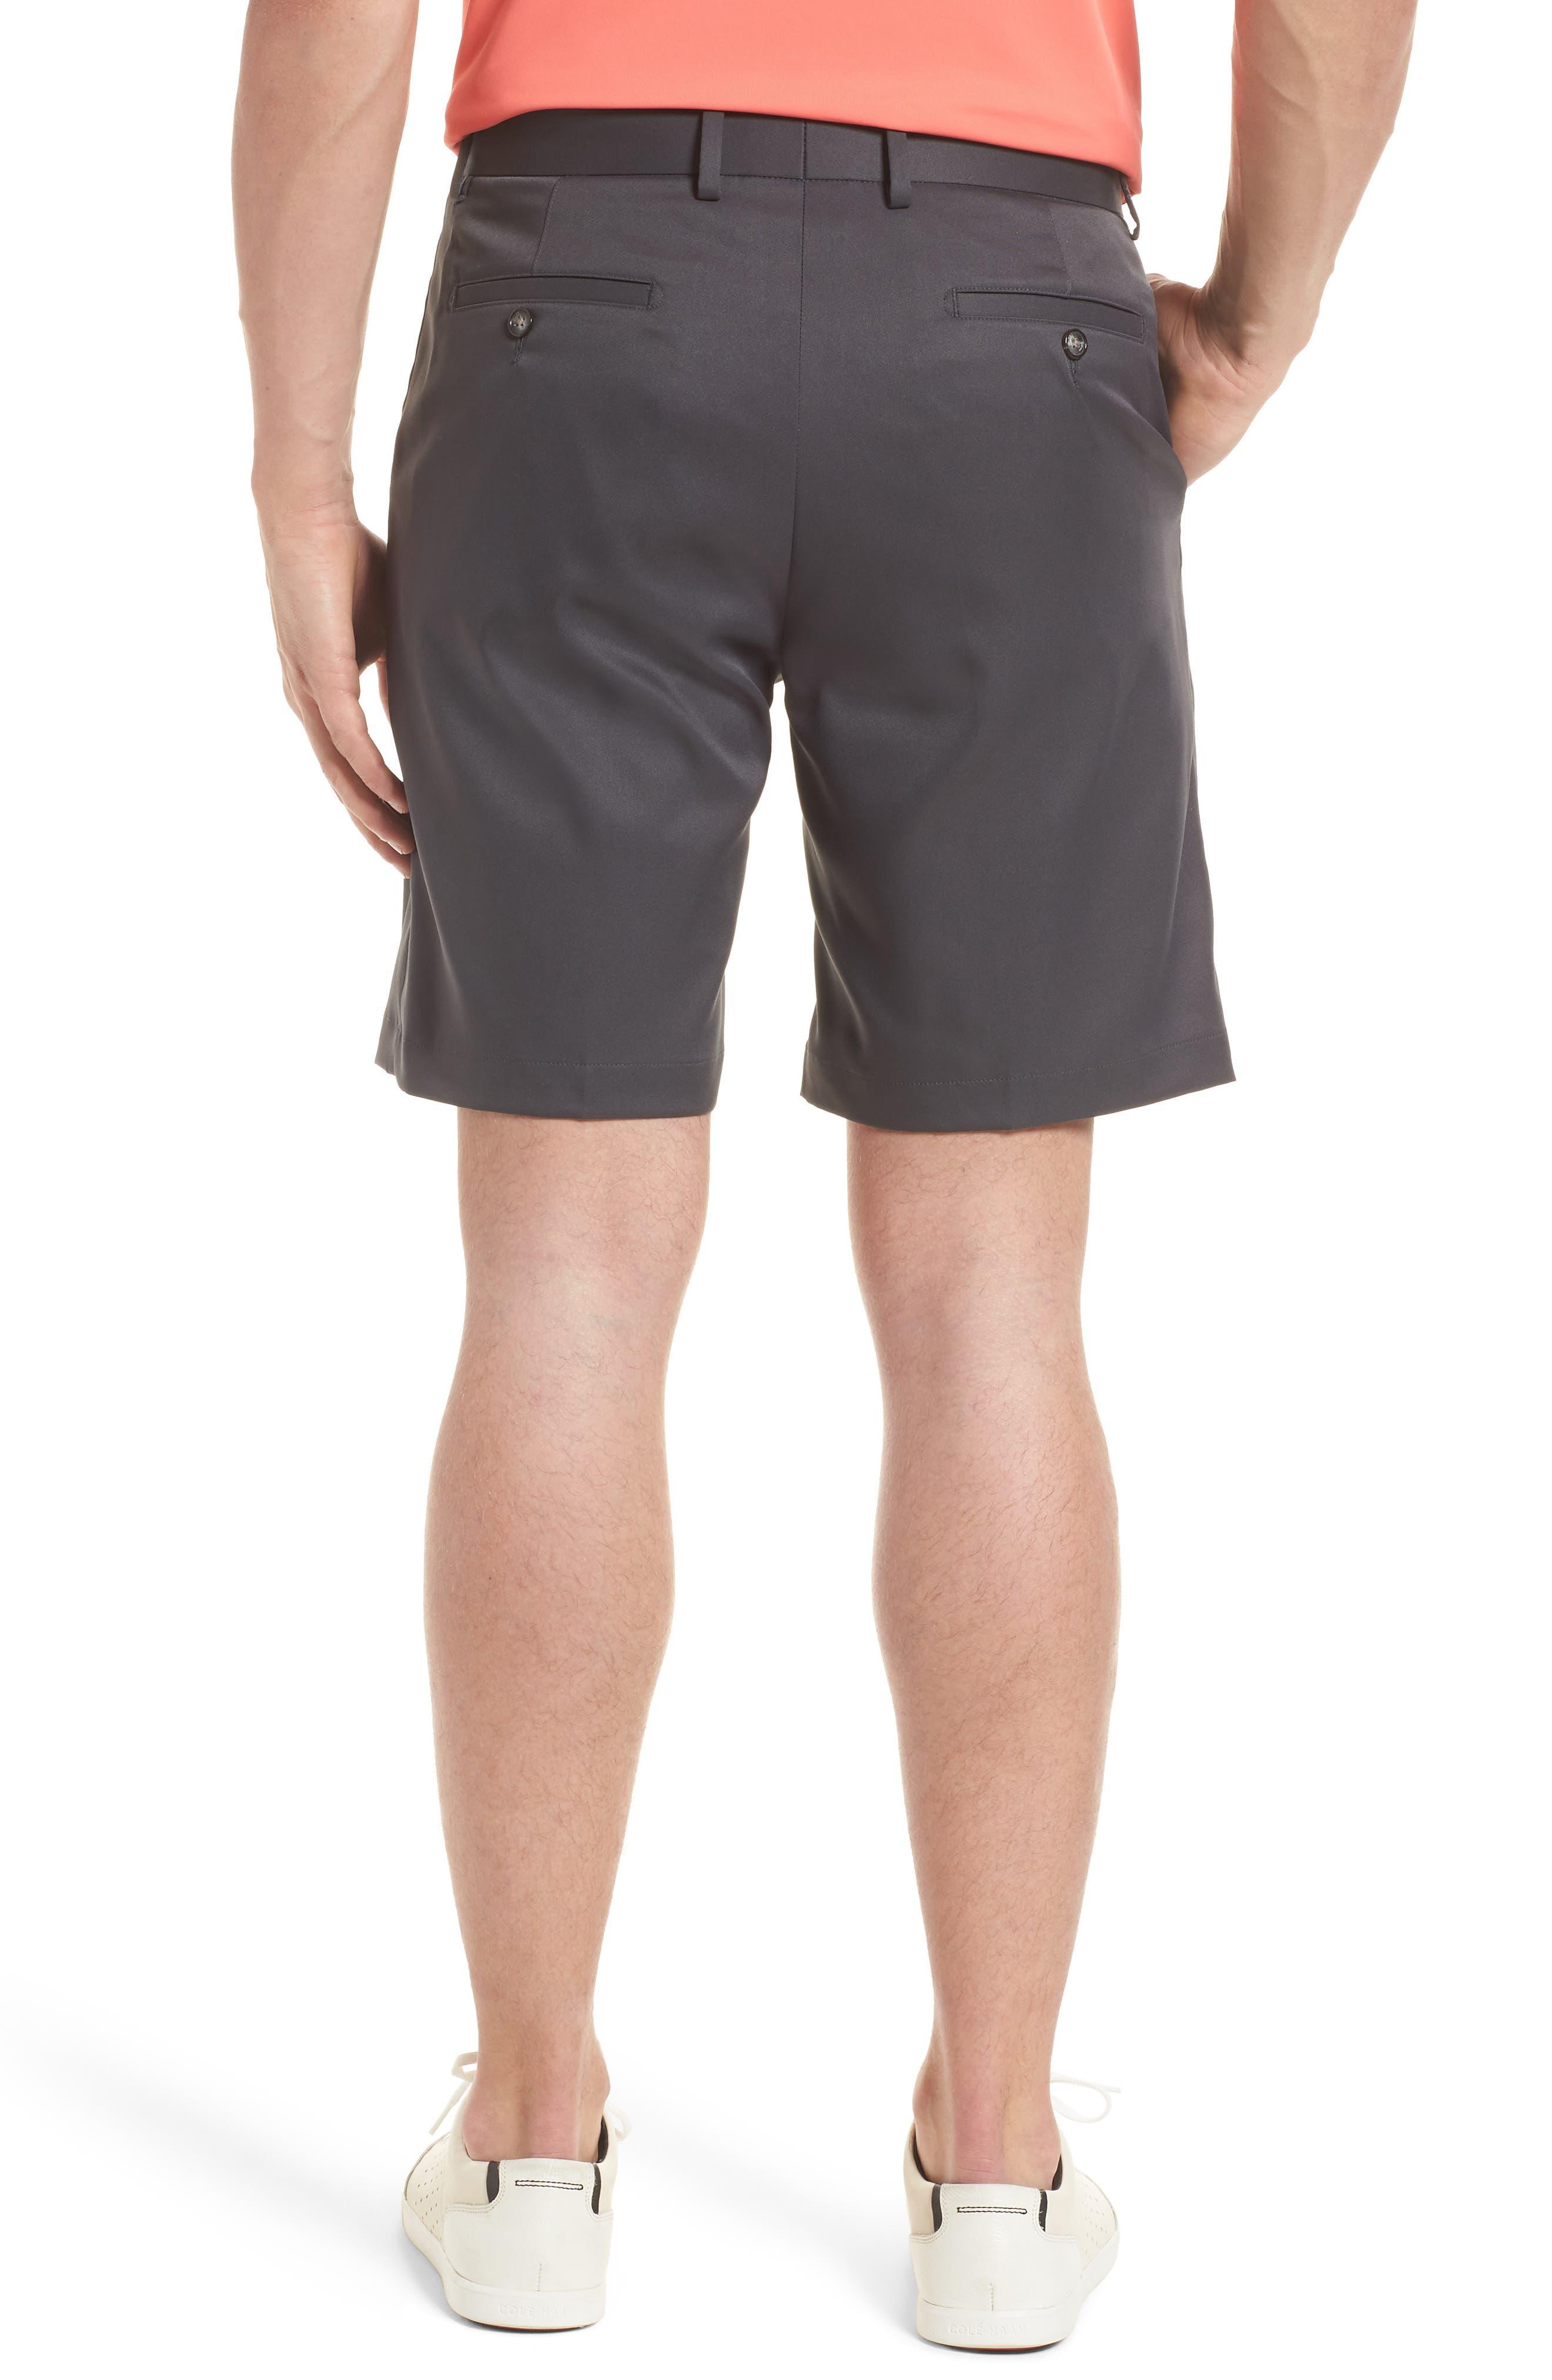 BOBBY JONES, Flat Front Tech Shorts, Alternate thumbnail 2, color, CHARCOAL